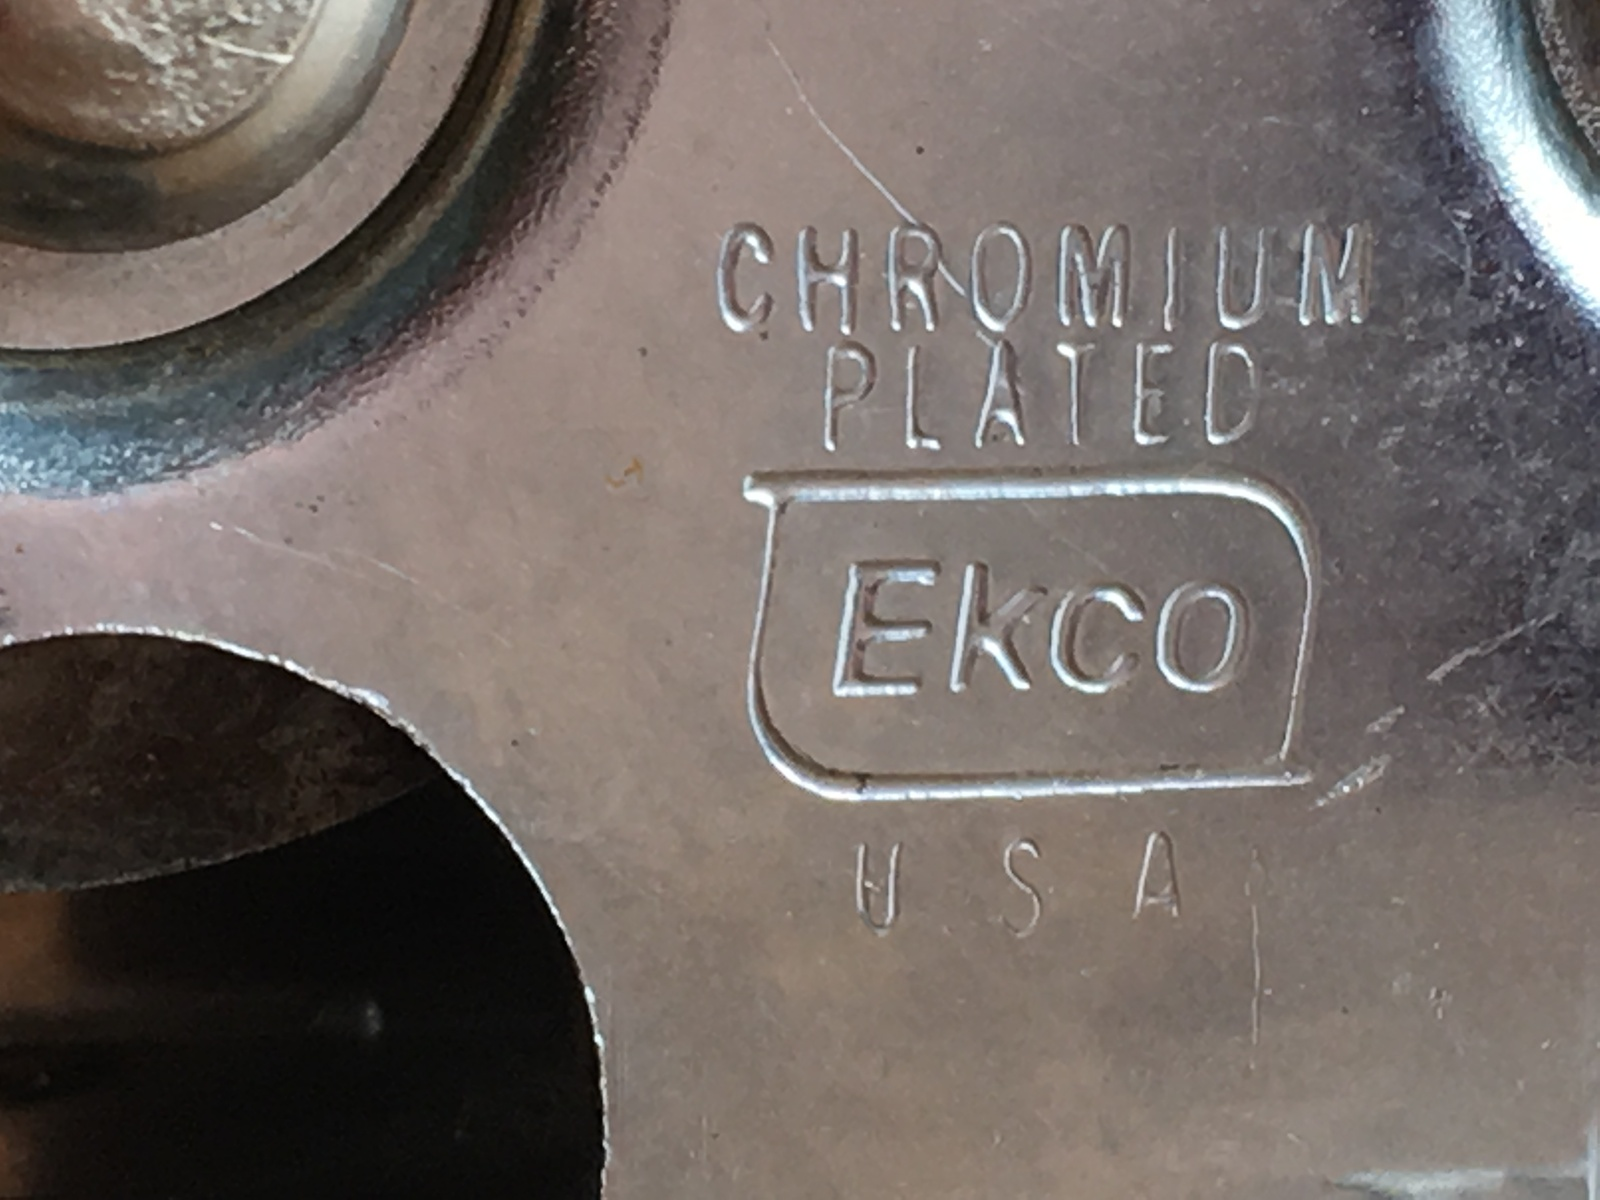 Vintage Chromium Plated EKCO Knife Sharpener Black Nylon/Plastic Handle U.S.A.